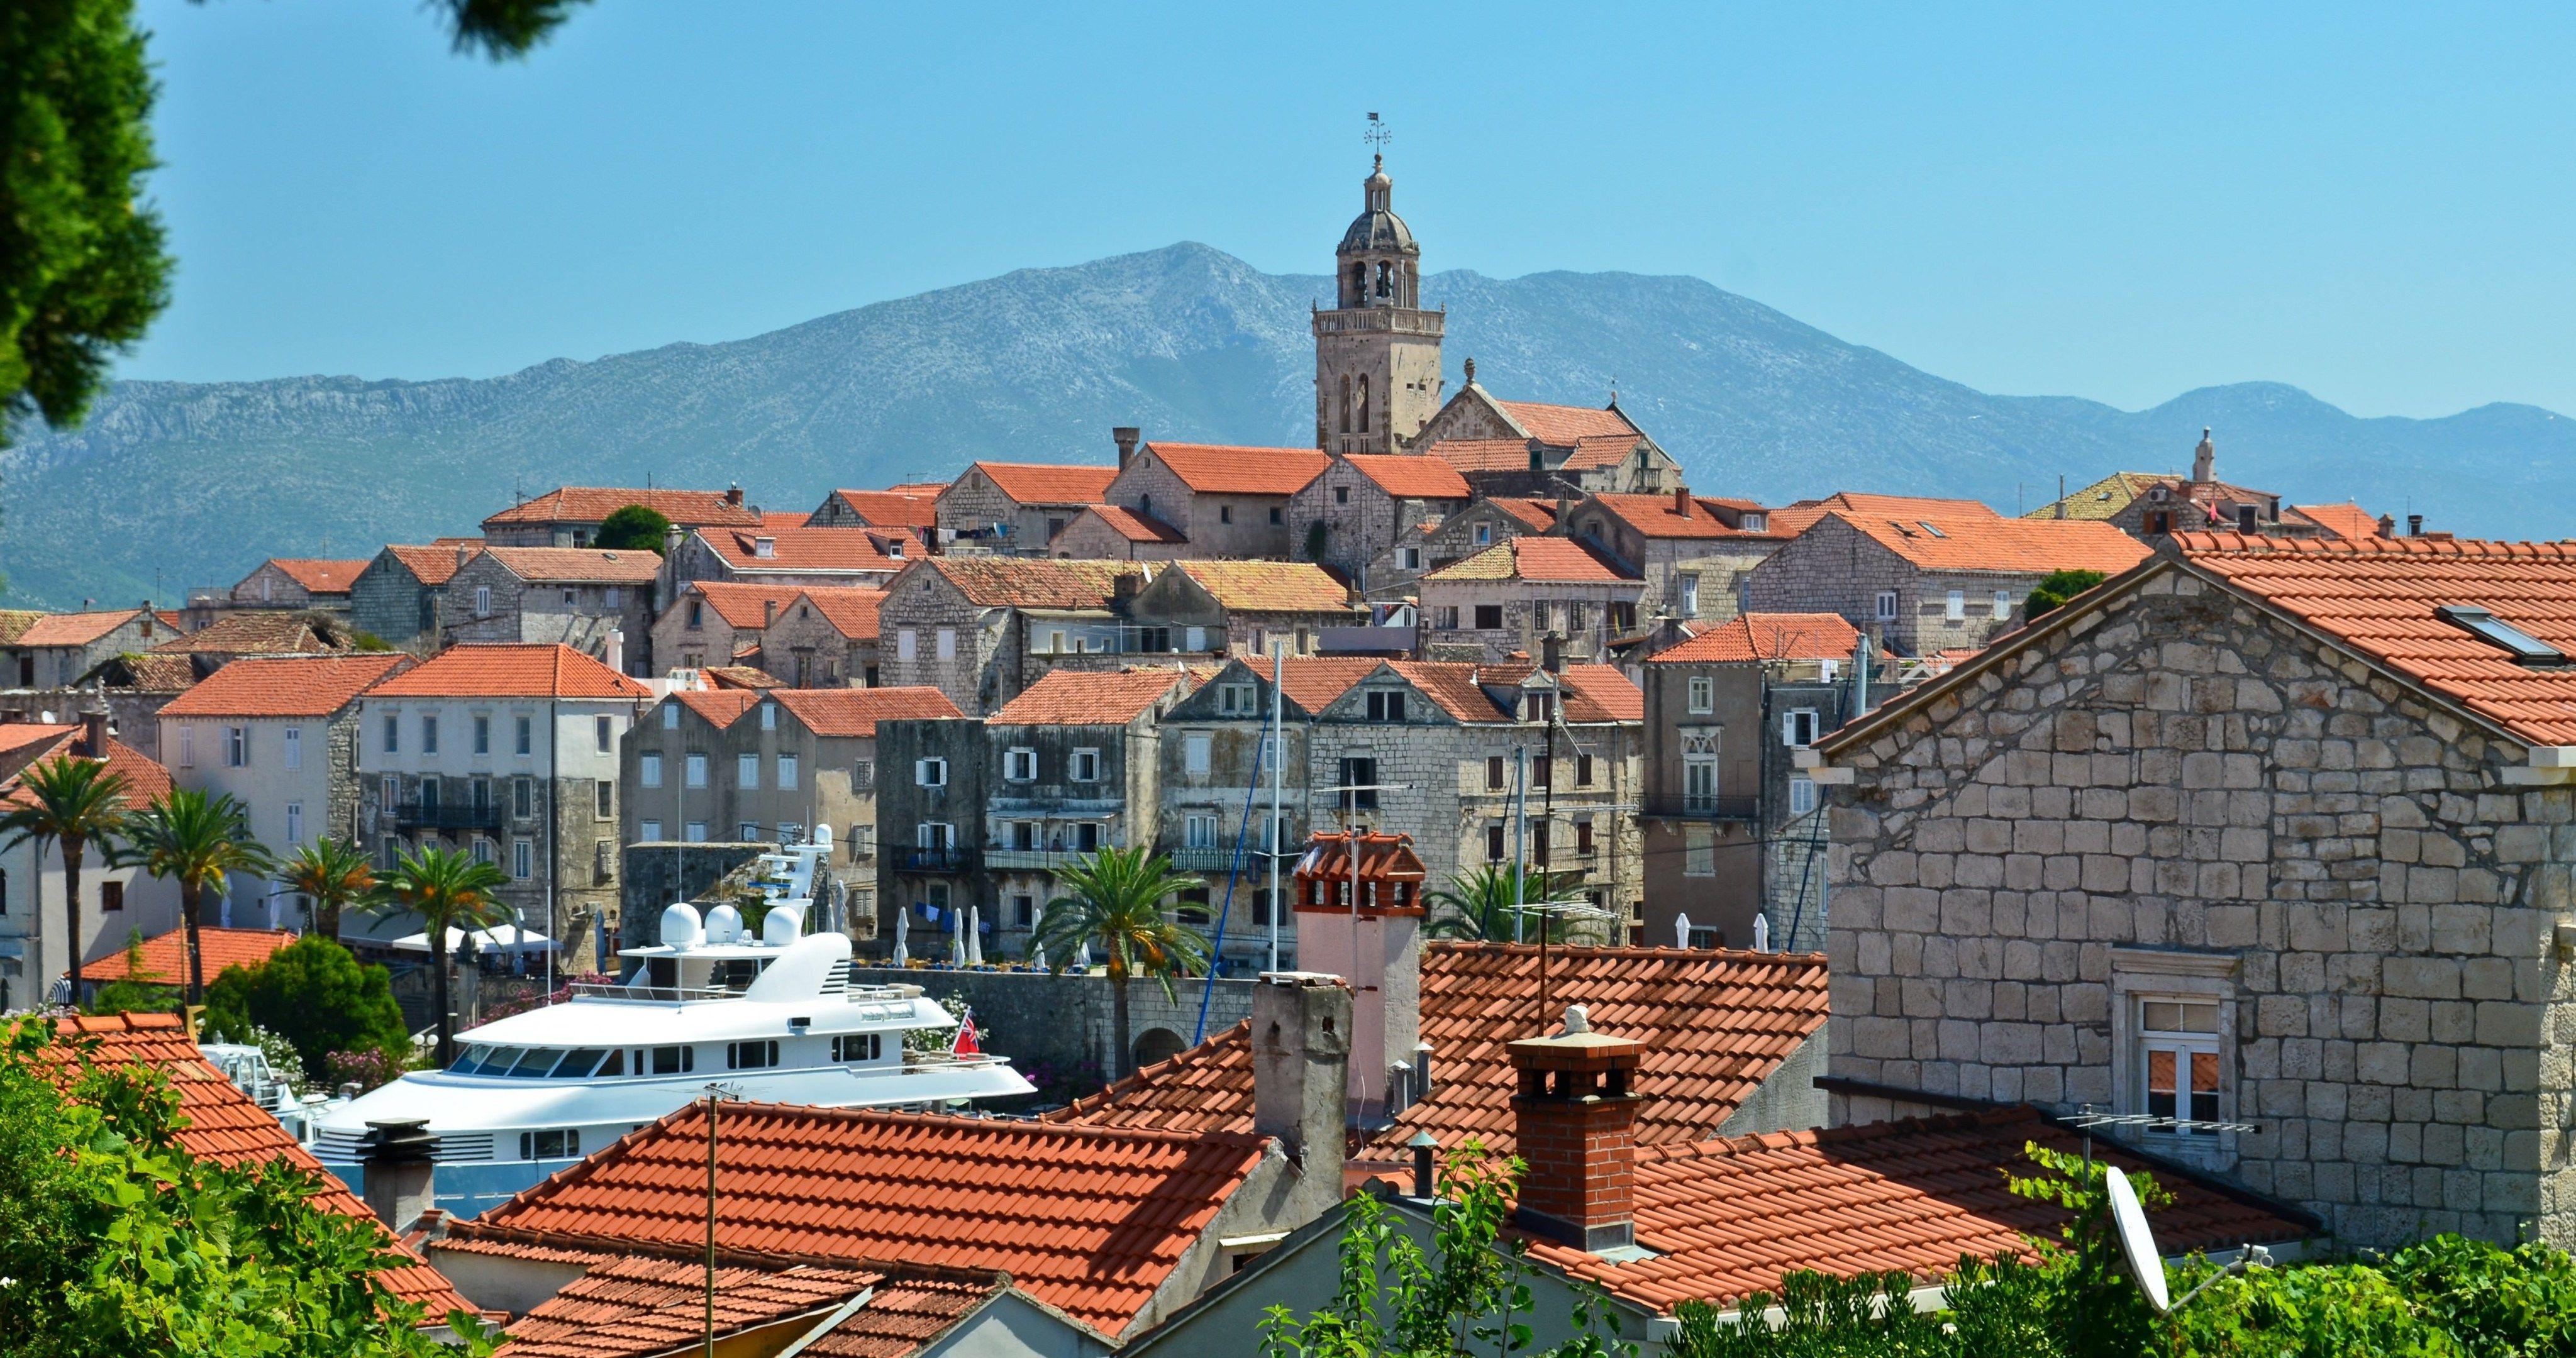 croatia old city 4k ultra hd wallpaper   World wallpaper ...